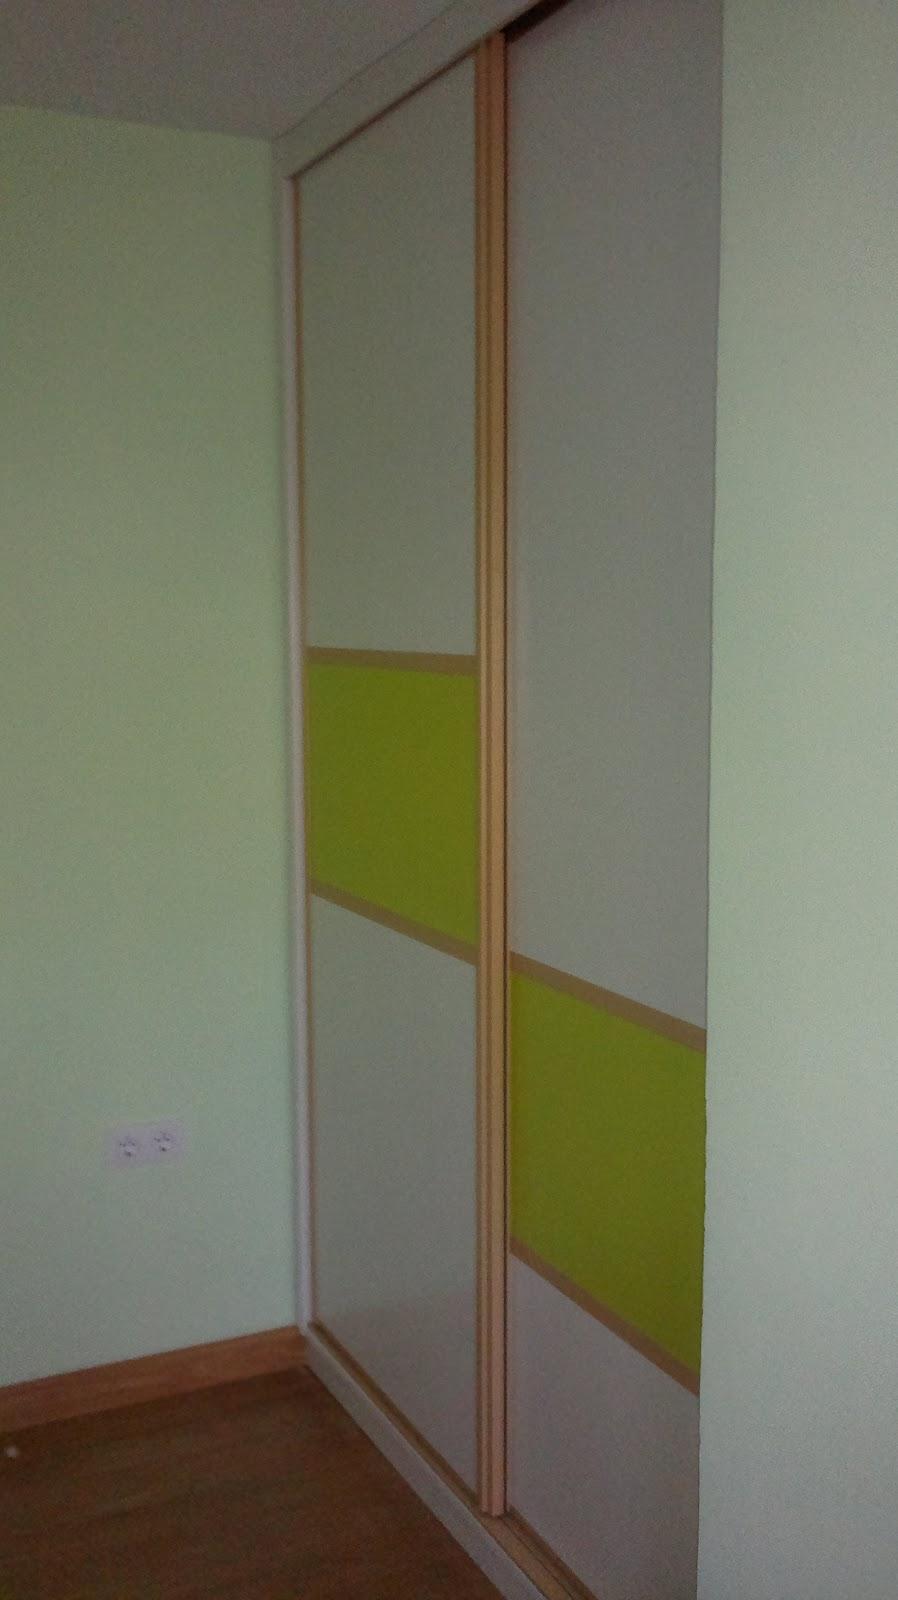 Muebles eduardo tallero armarios empotrados dise os de - Disenos de armarios empotrados ...